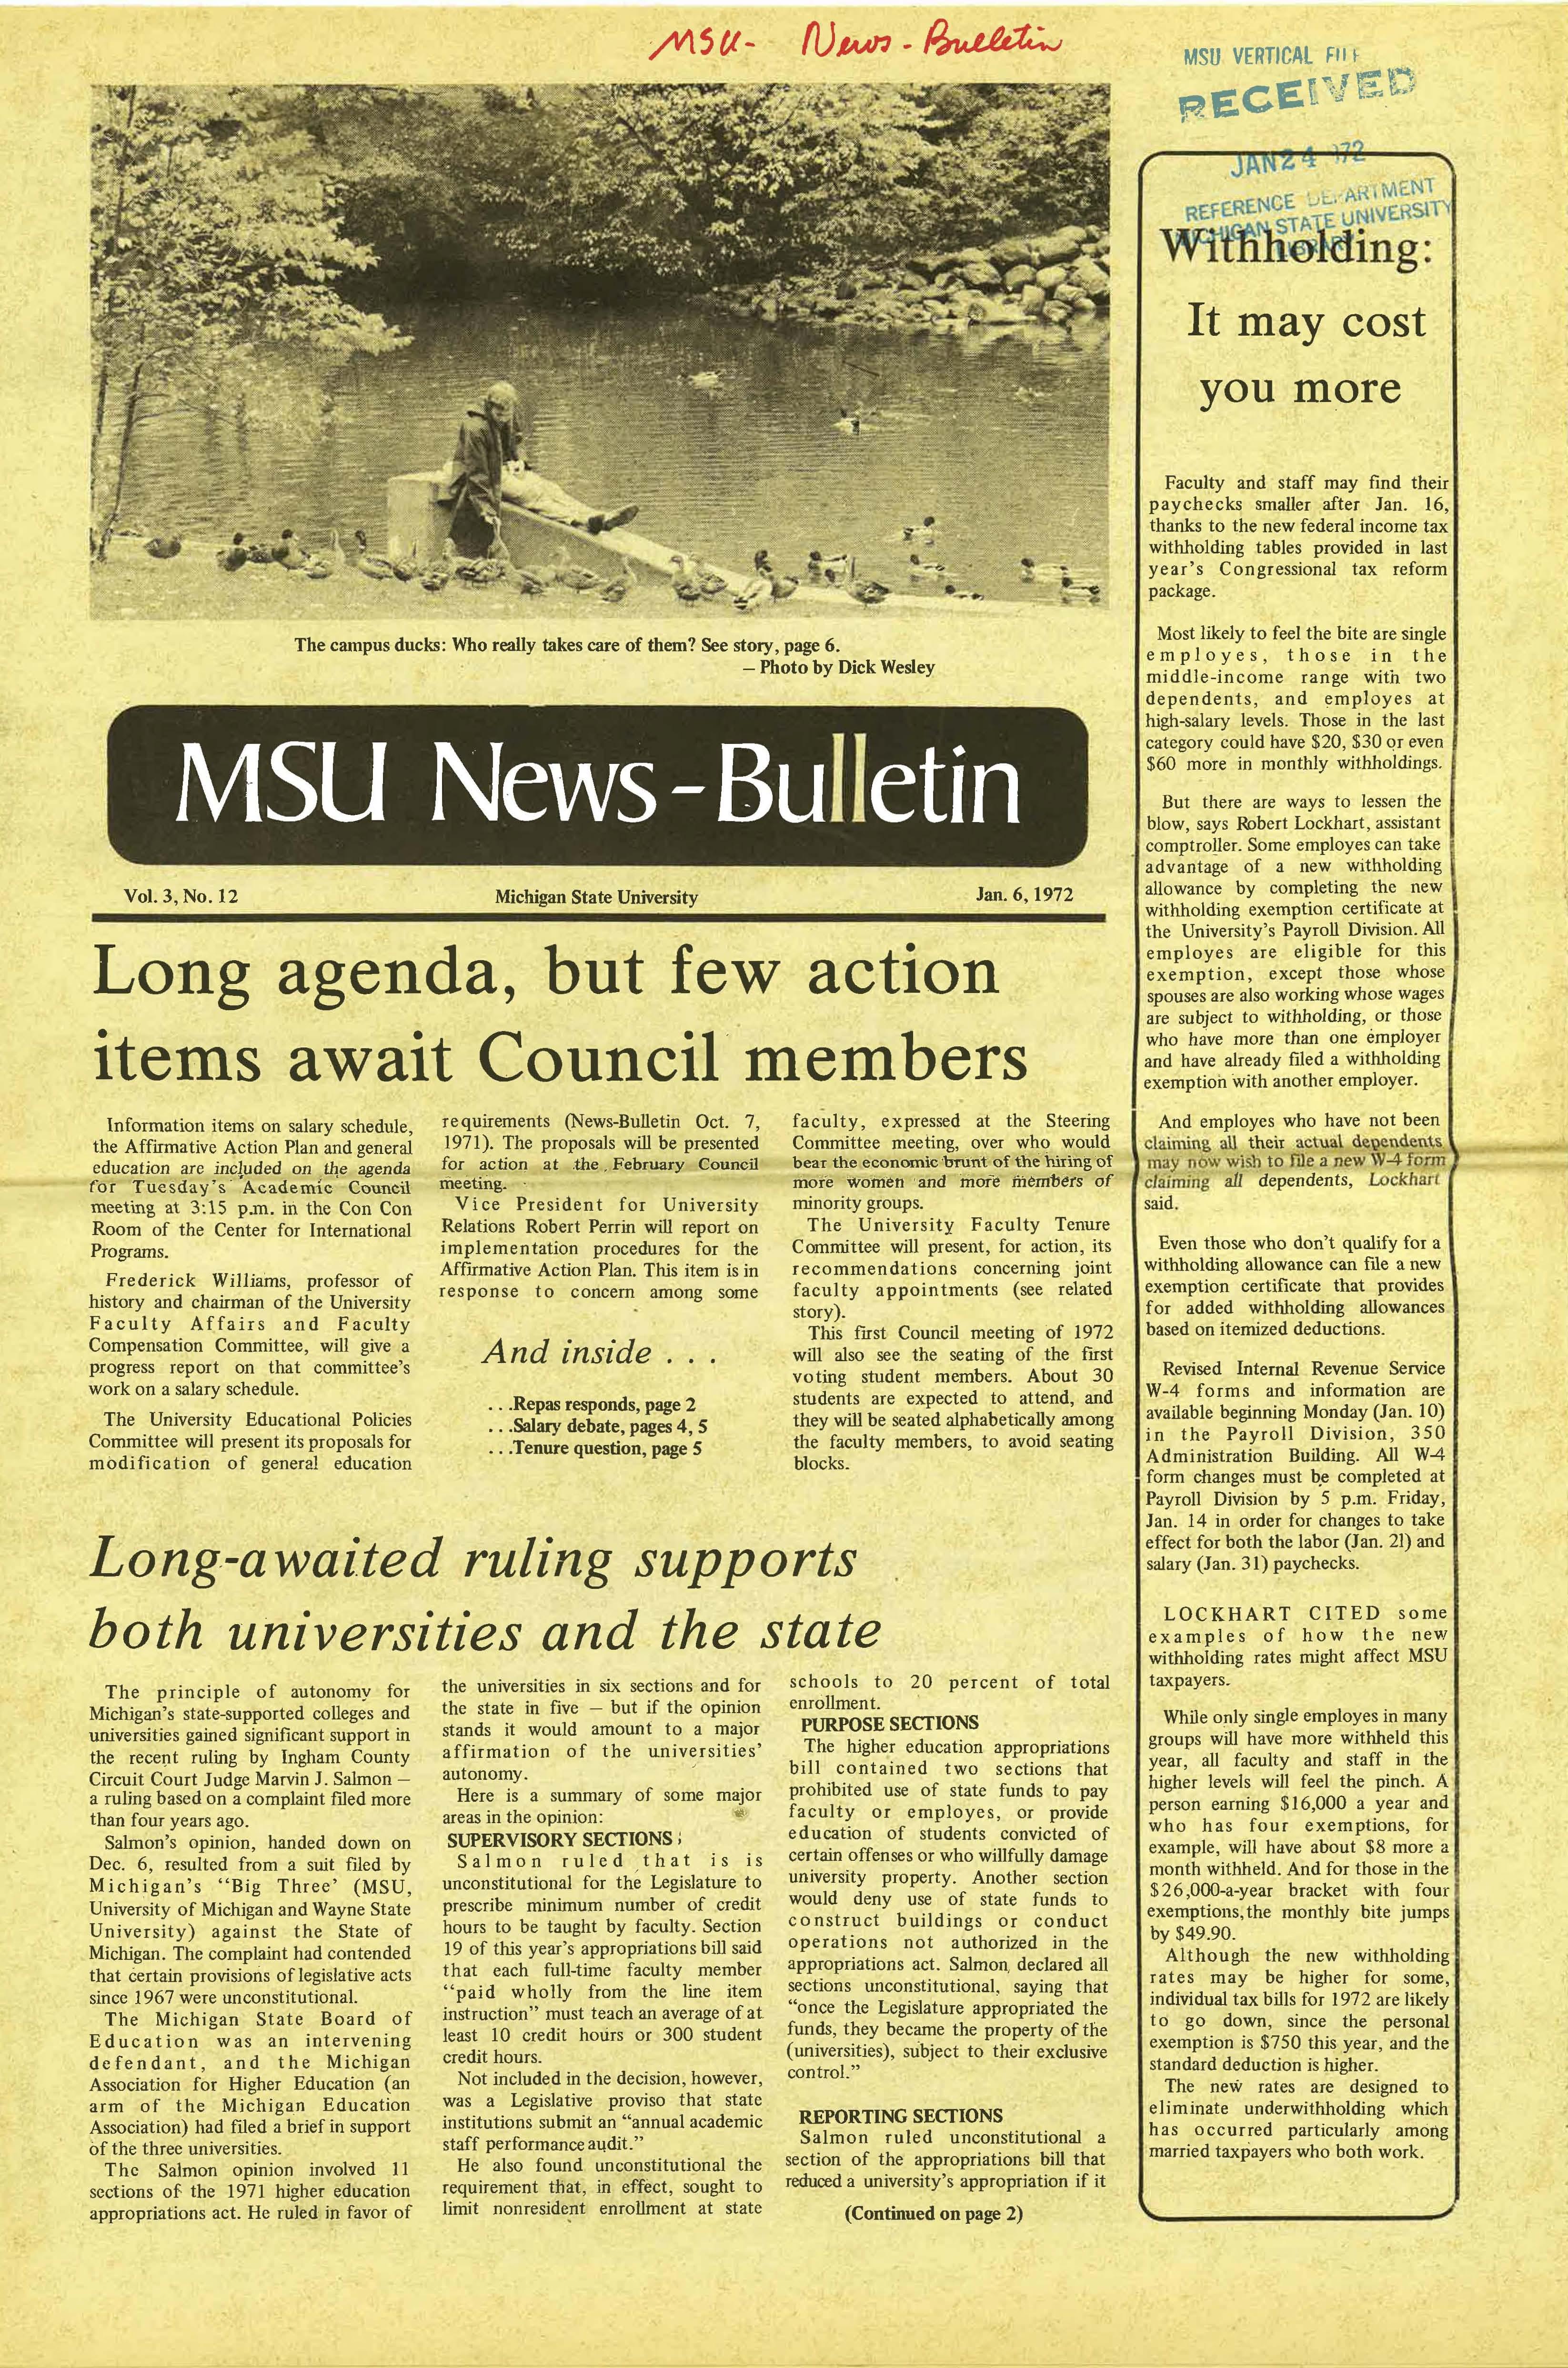 MSU News Bulletin, vol. 3, No. 22, March 30, 1972